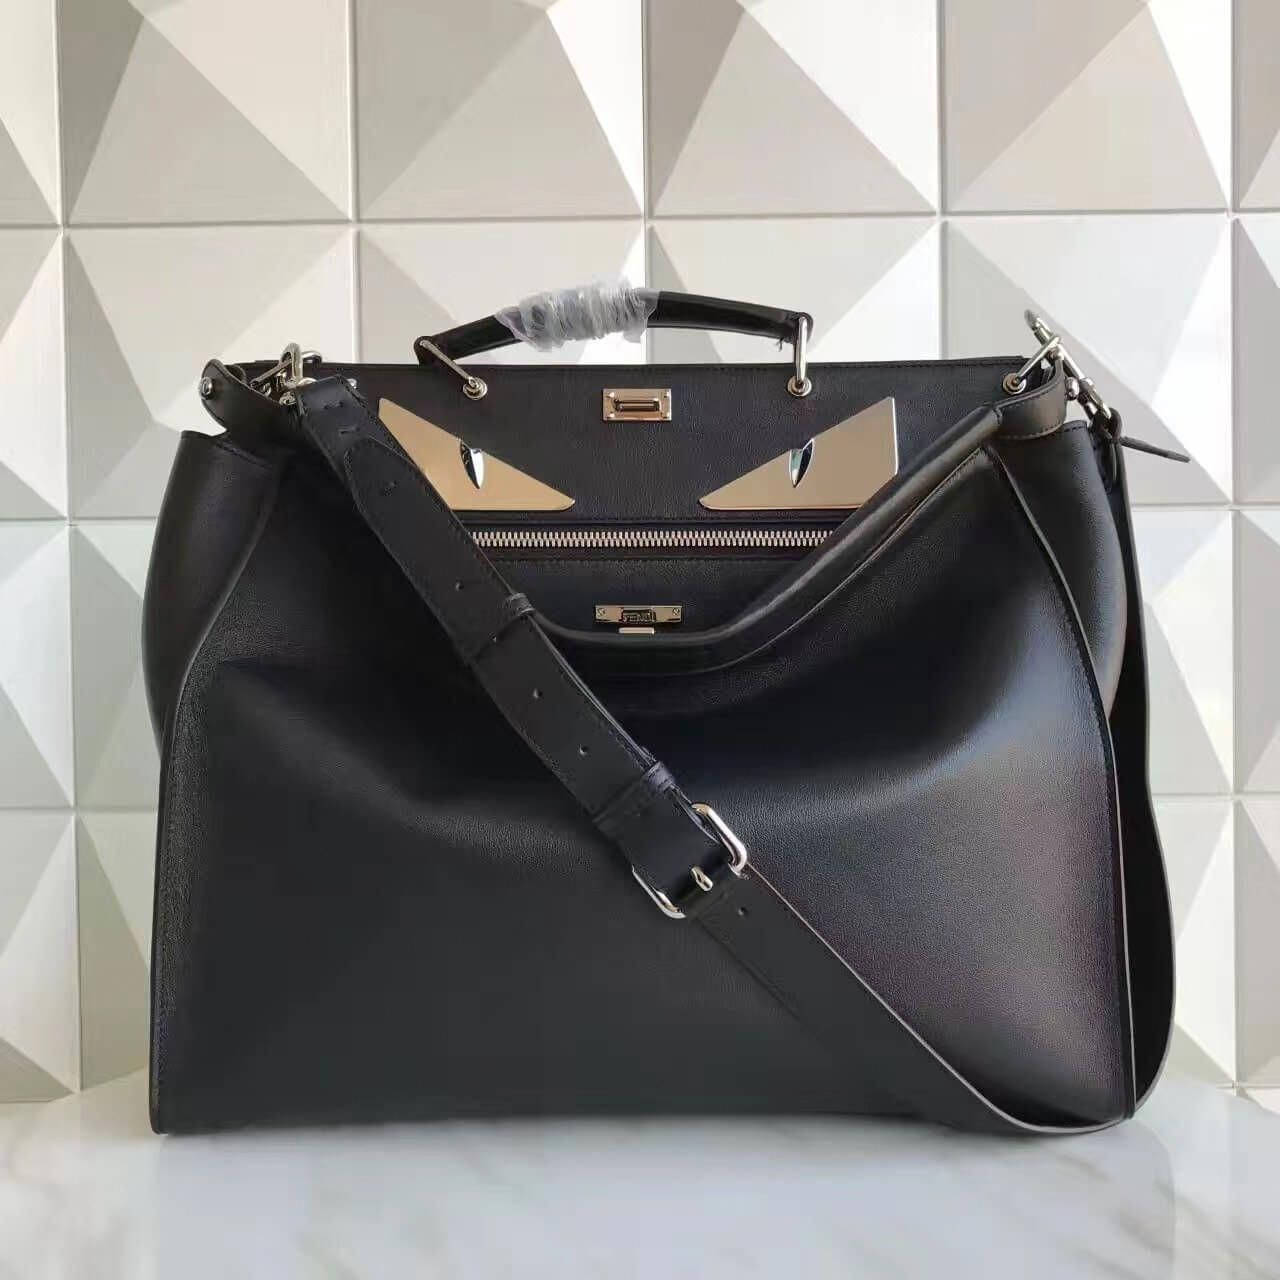 92ef00c04cd8 Fendi Black Calfskin Peekaboo Bag With Metal Bag Bugs Eyes 2017  fendipurse